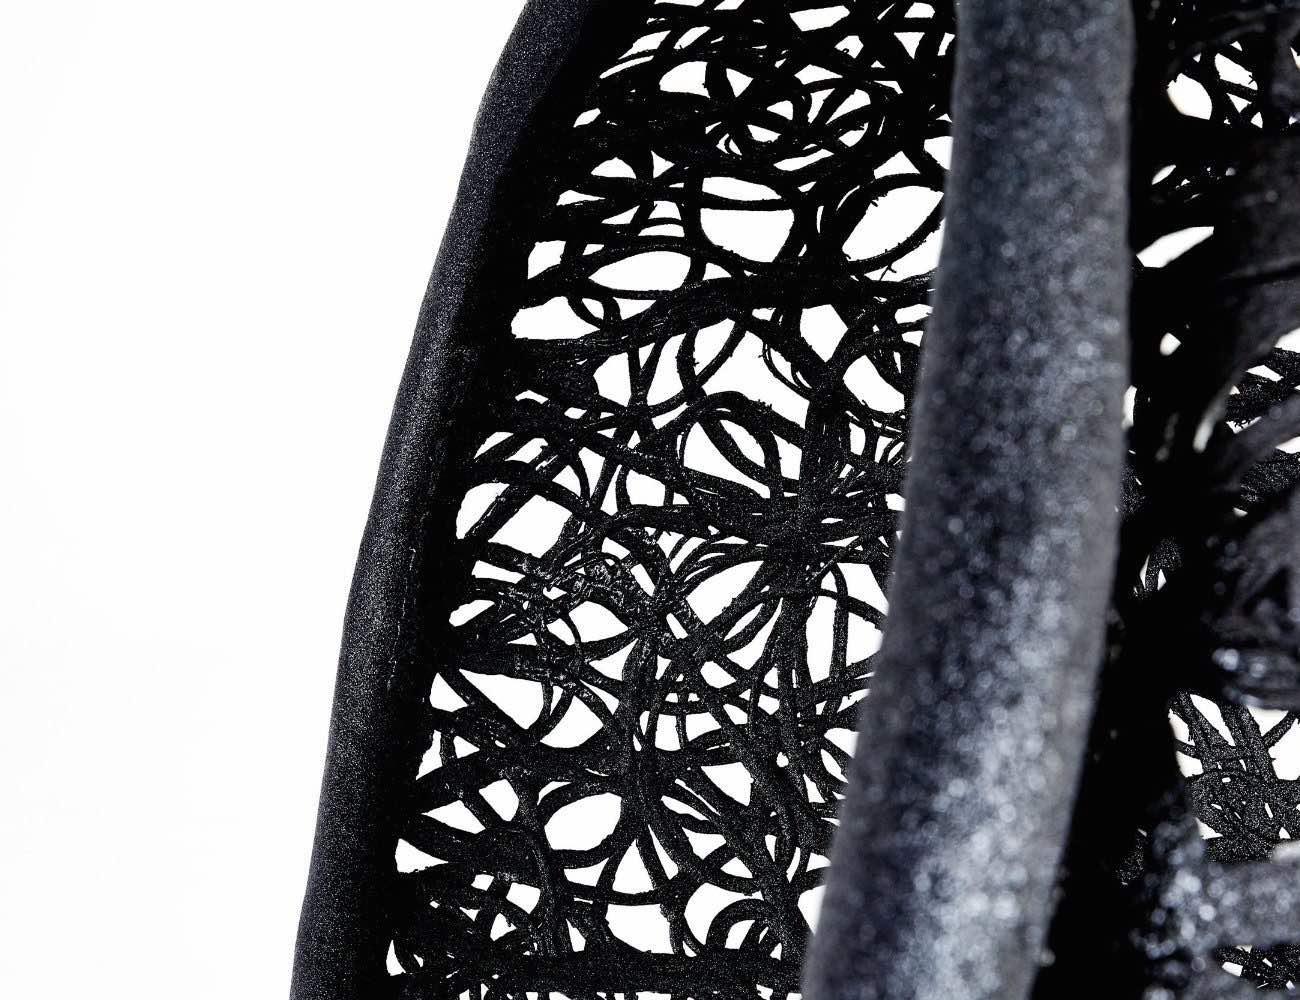 Manu Nest Compact Hanging Chair by Maffam